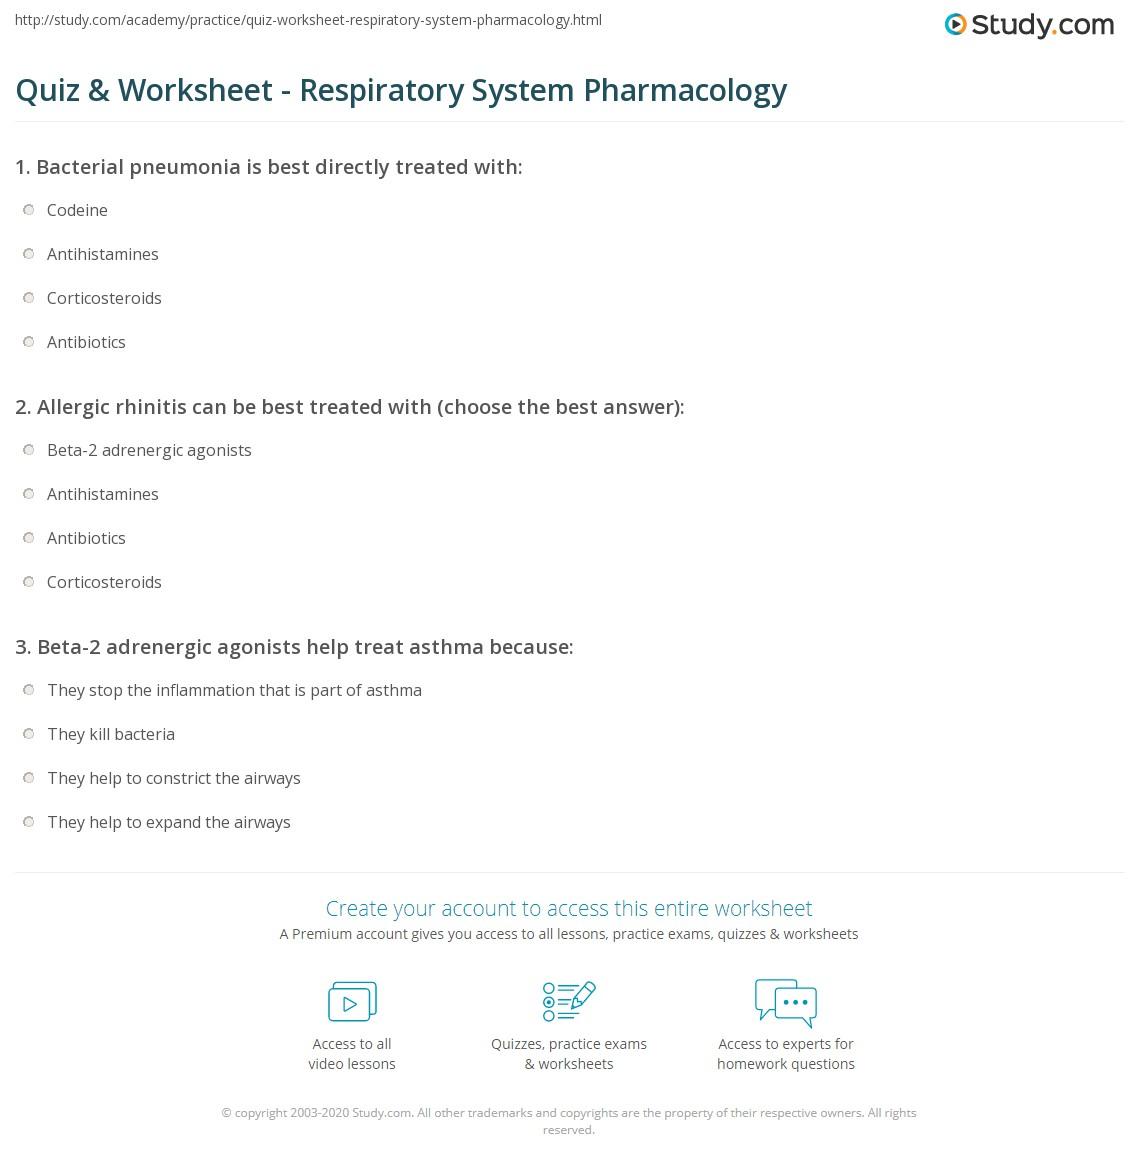 worksheet Respiratory System Worksheet Answers quiz worksheet respiratory system pharmacology study com print worksheet